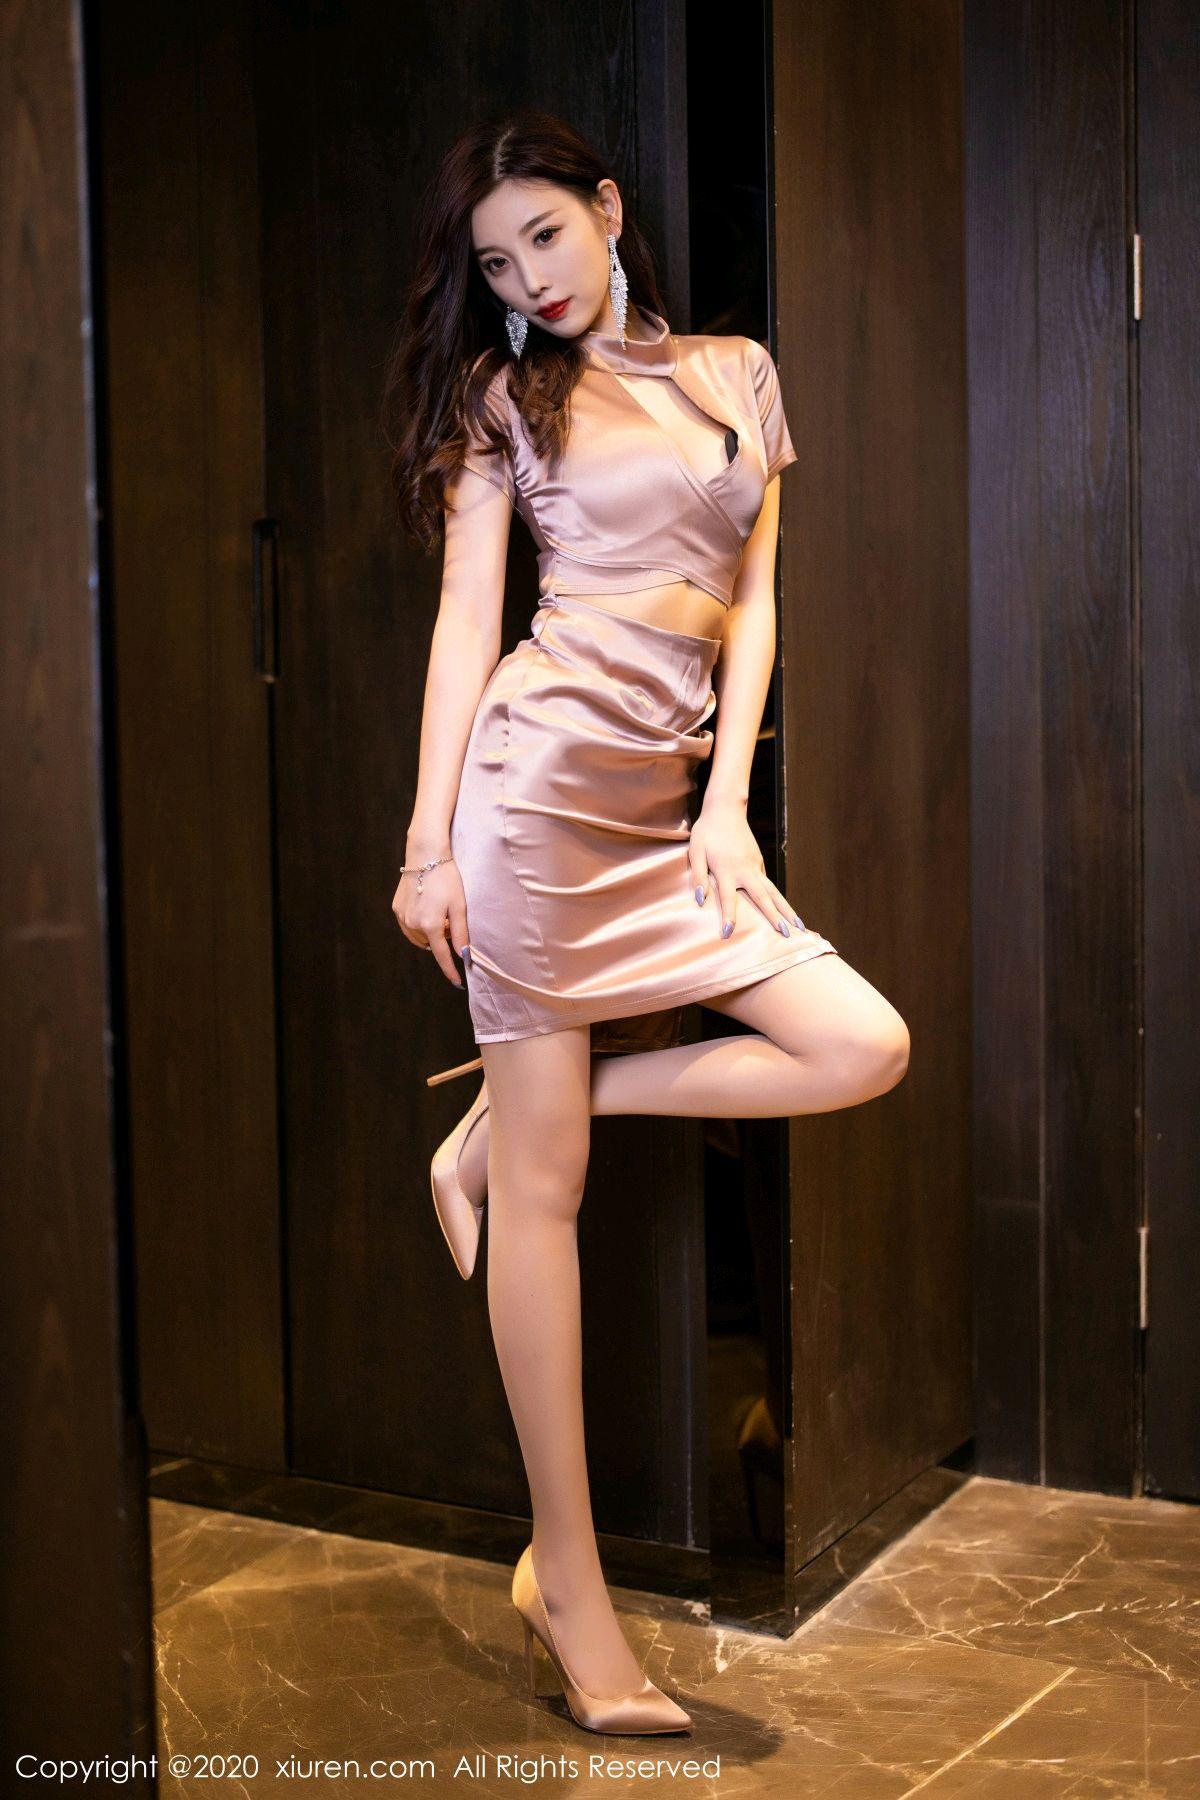 [XiuRen] Vol.2587 Yang Chen Chen 73P, Underwear, Xiuren, Yang Chen Chen